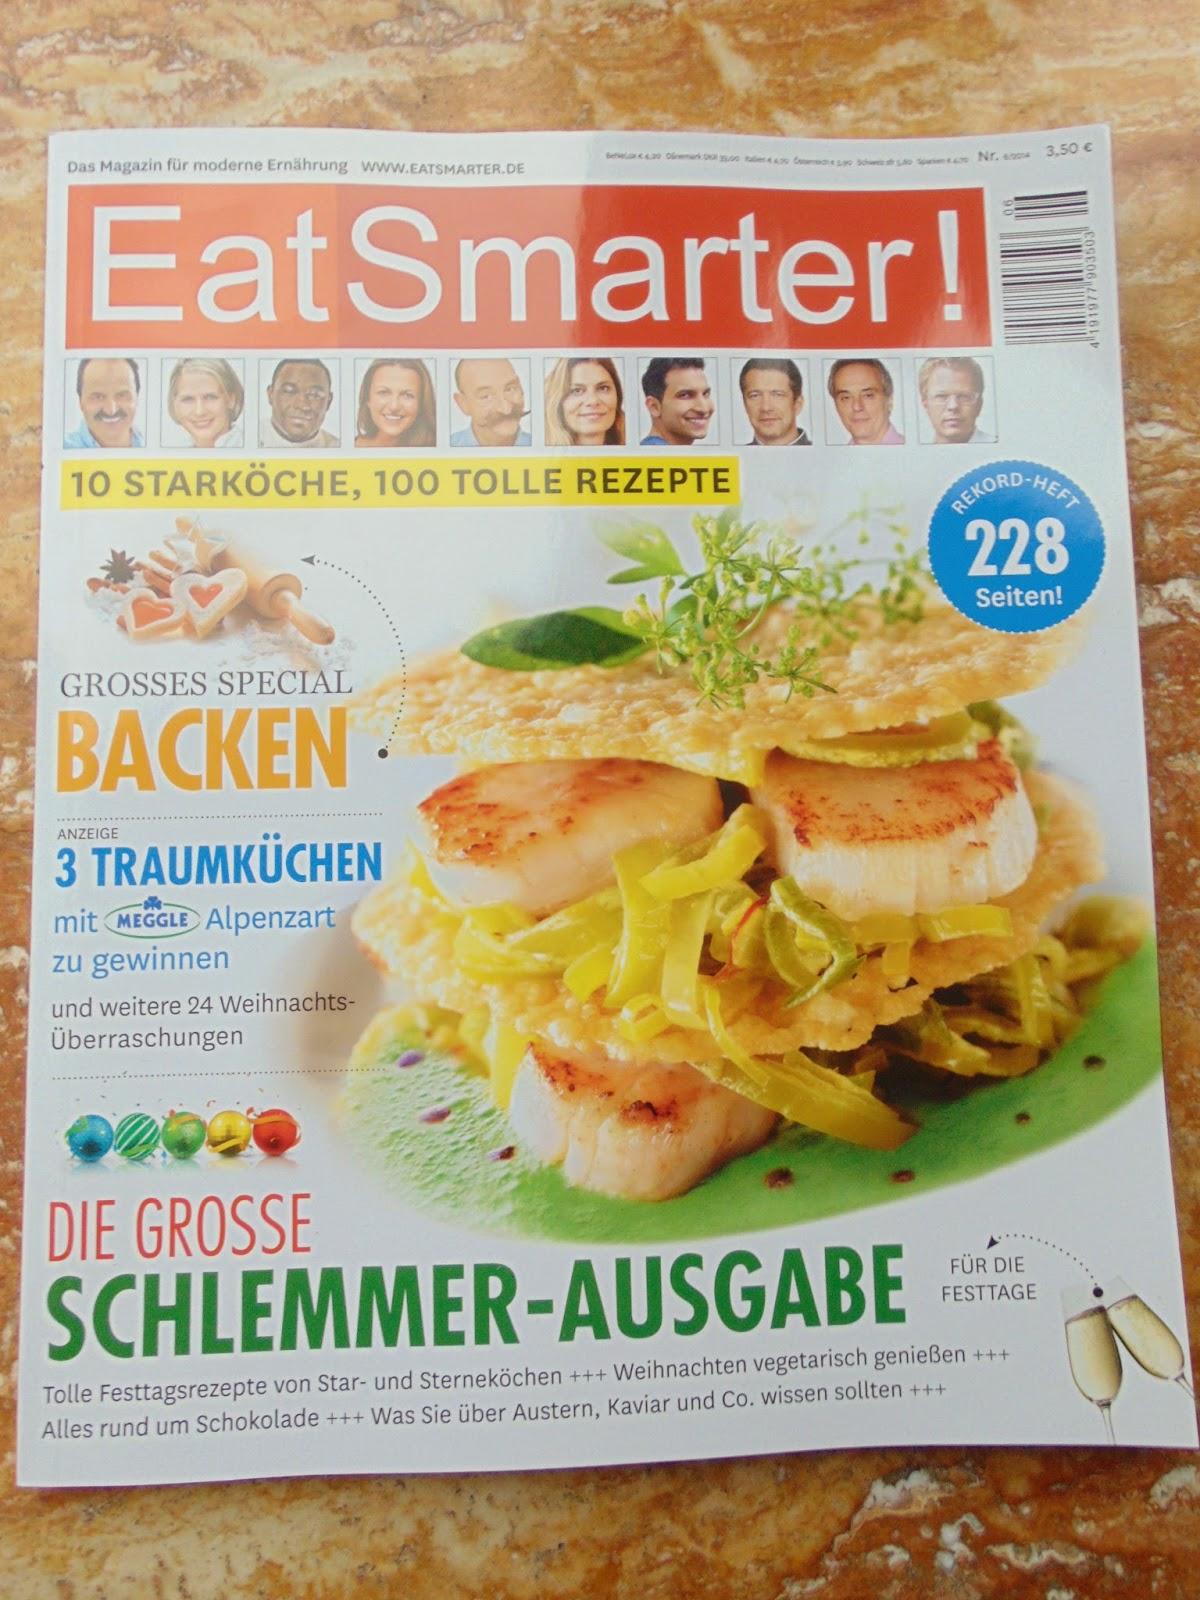 Eat Smarter - www.annitschkasblog.de